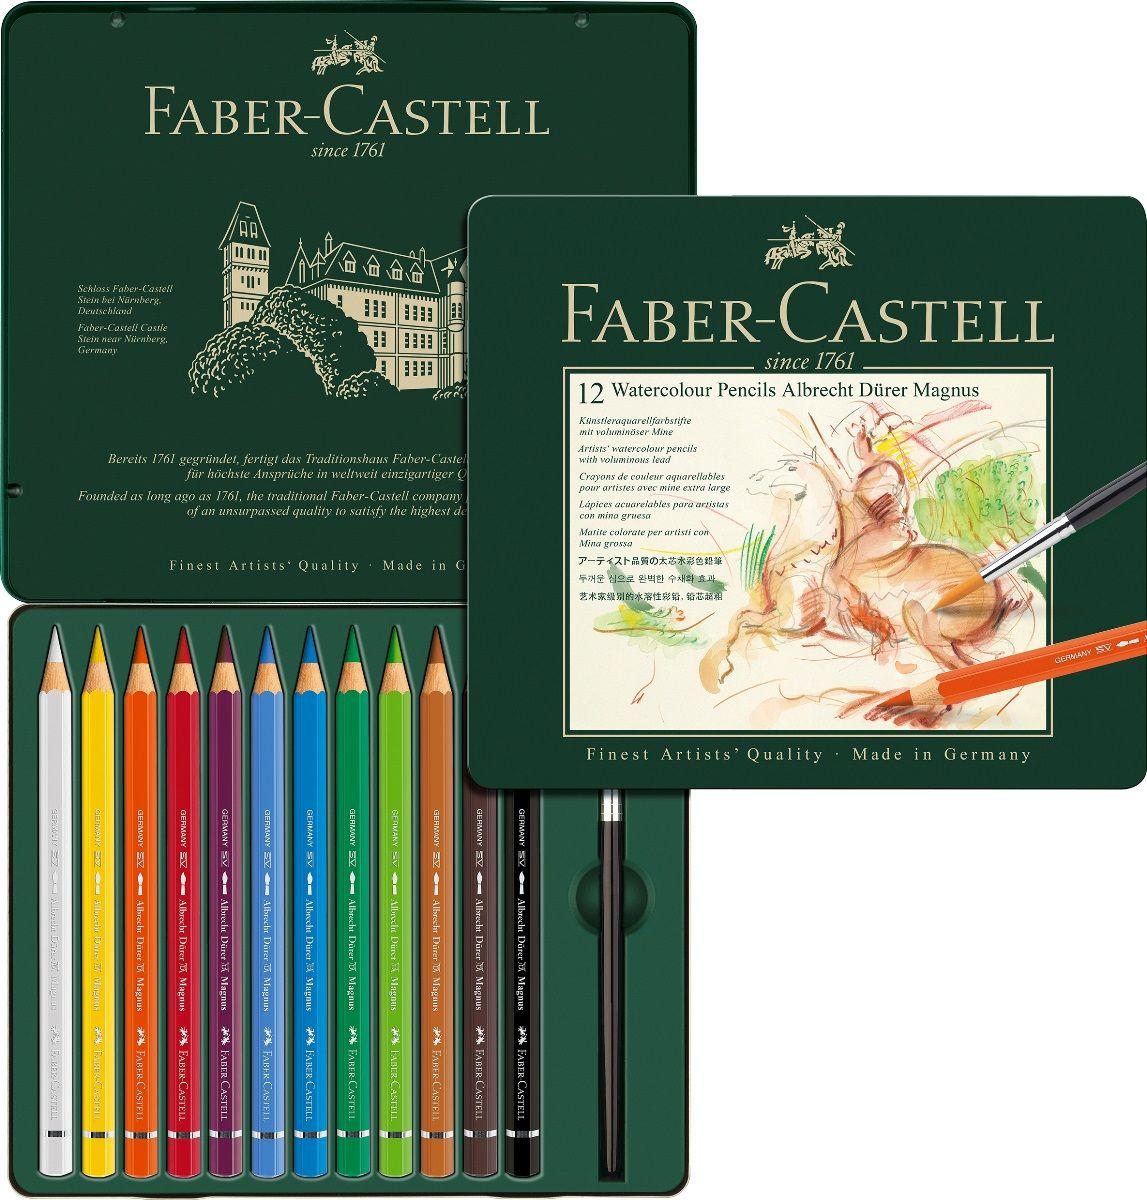 Faber-Castell Набор цветных акварельных карандашей Albrecht Durer 12 цветов faber castell грифель для карандаша superpolymer h 0 5 мм 12 шт